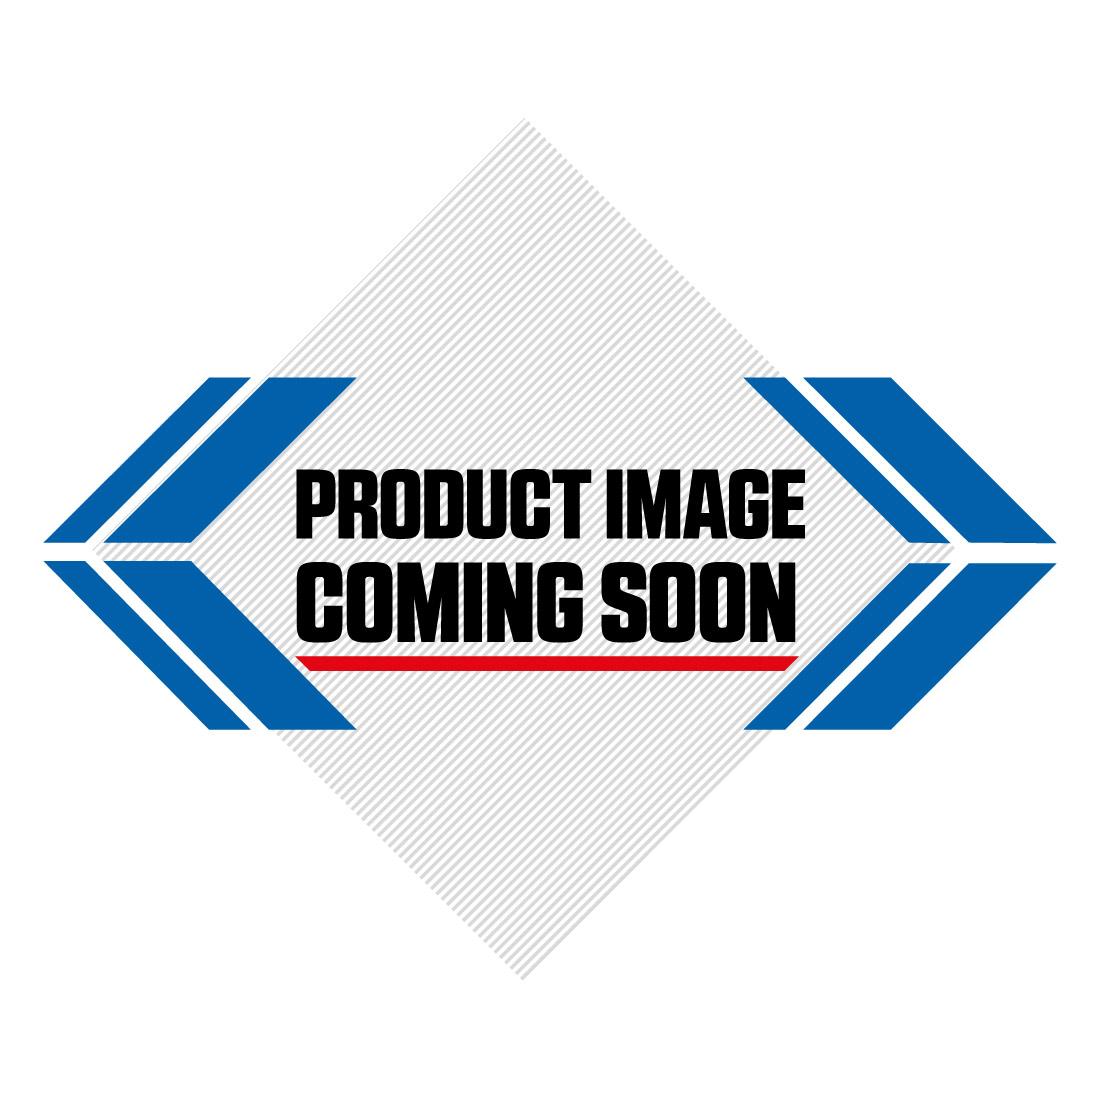 UFO KTM Plastic Kit SX 125 150 250 SXF 250 350 450 (16-18) OEM 17 Image-4>